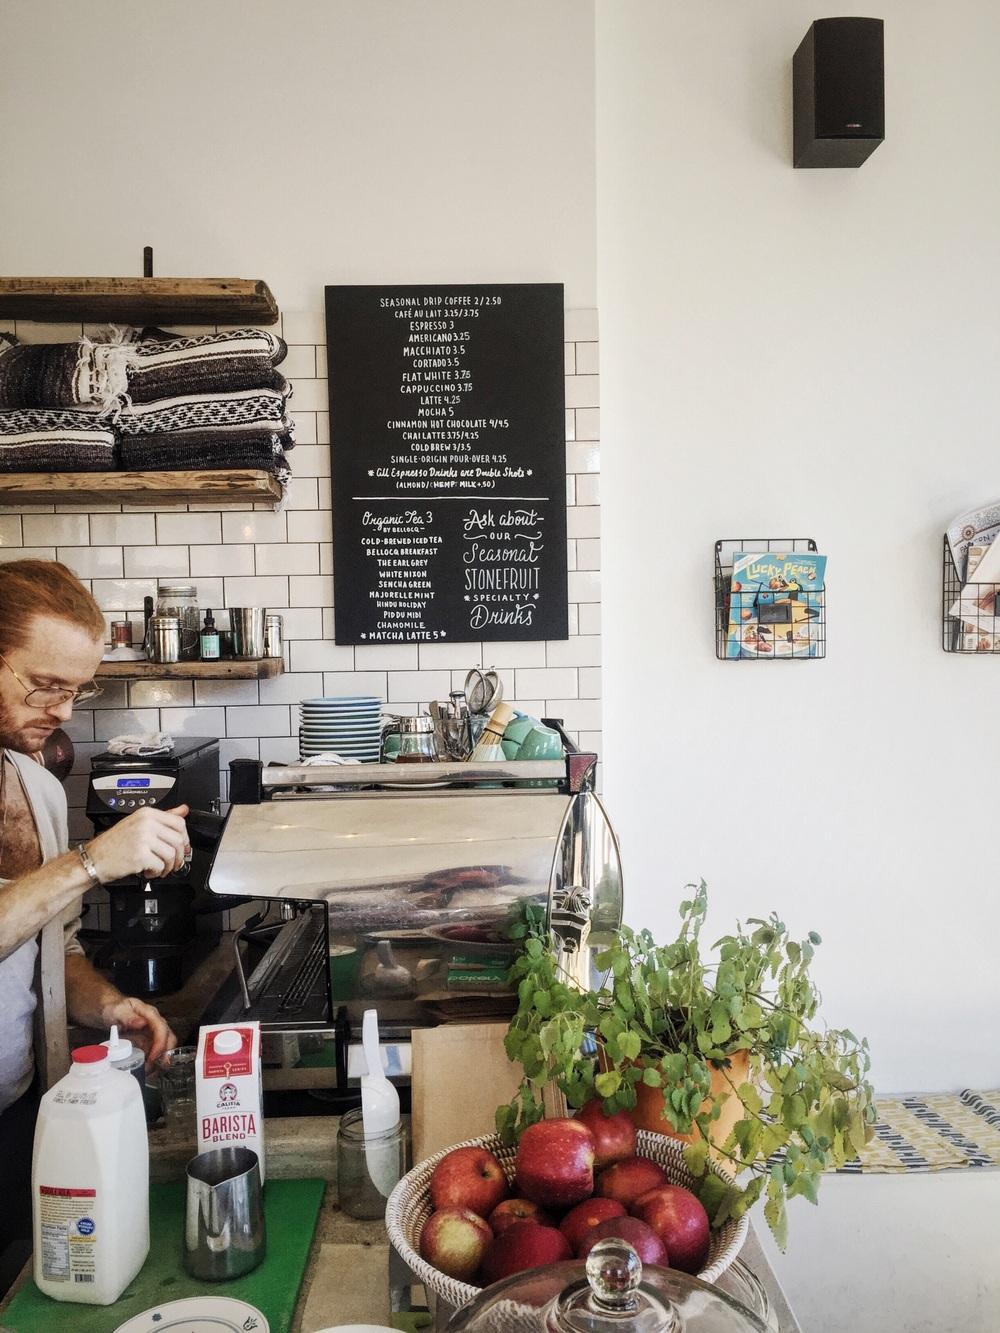 stonefruit_espresso_menu.jpg